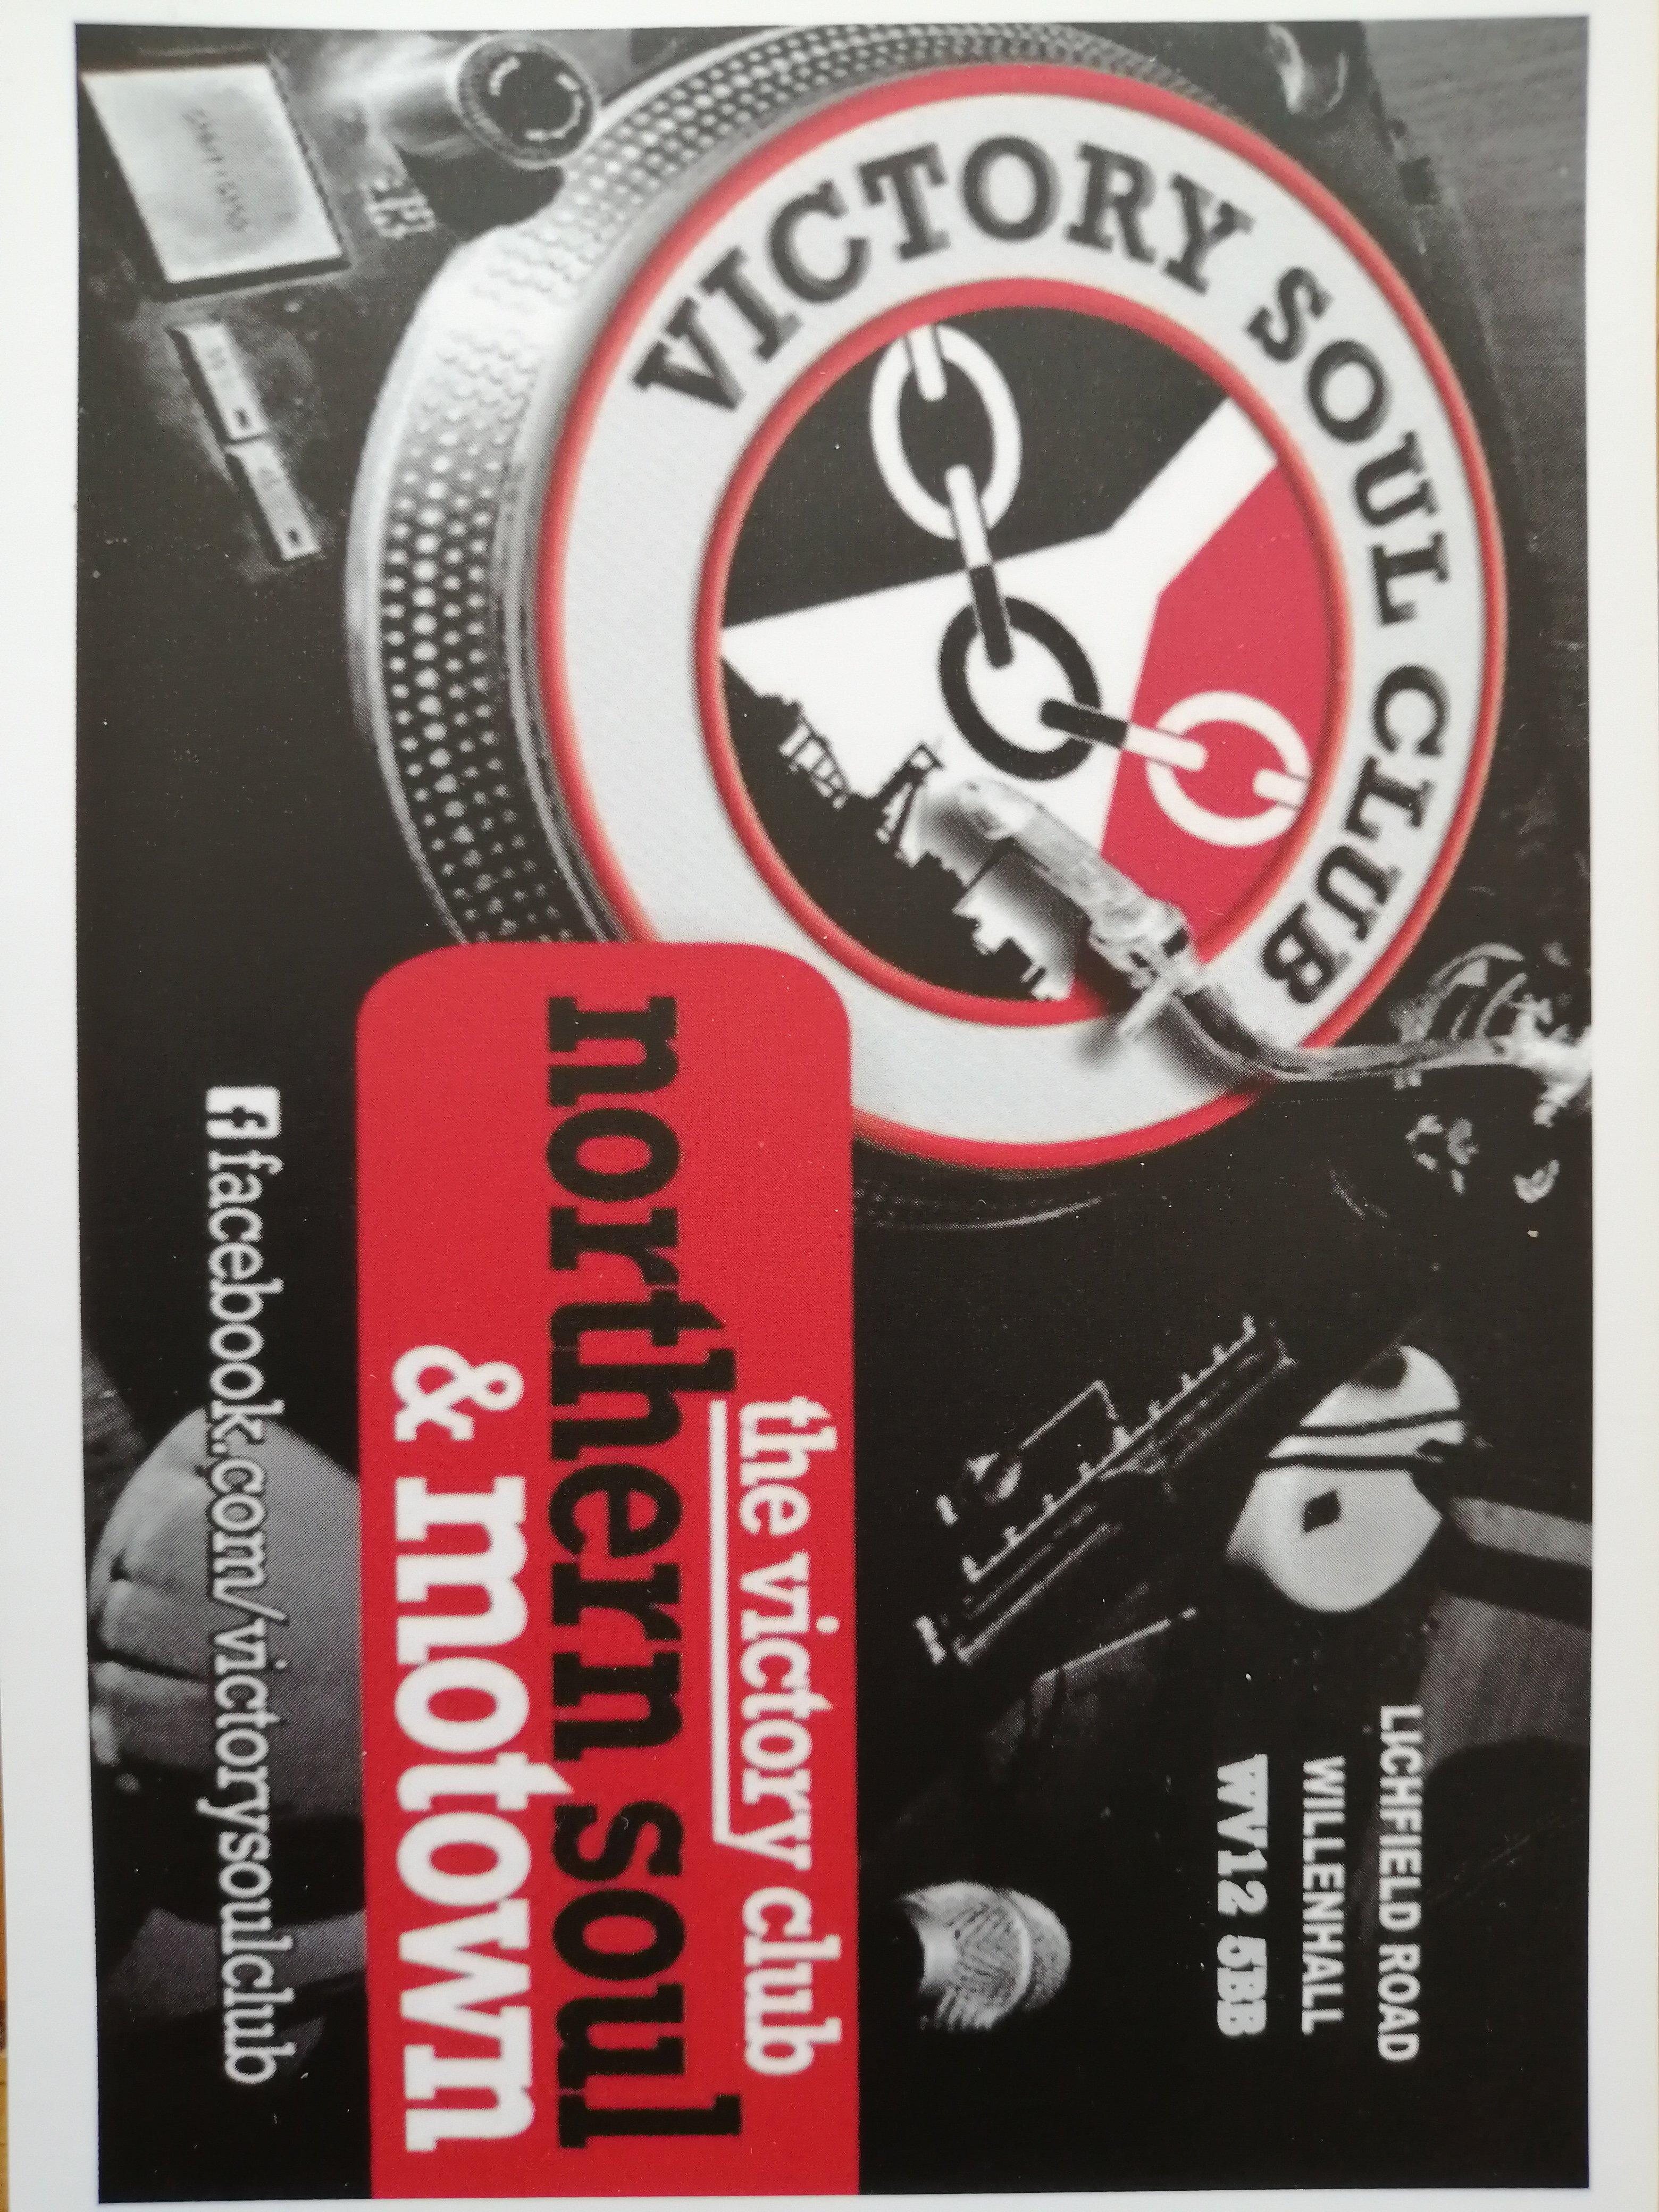 Victory Soul Club flyer